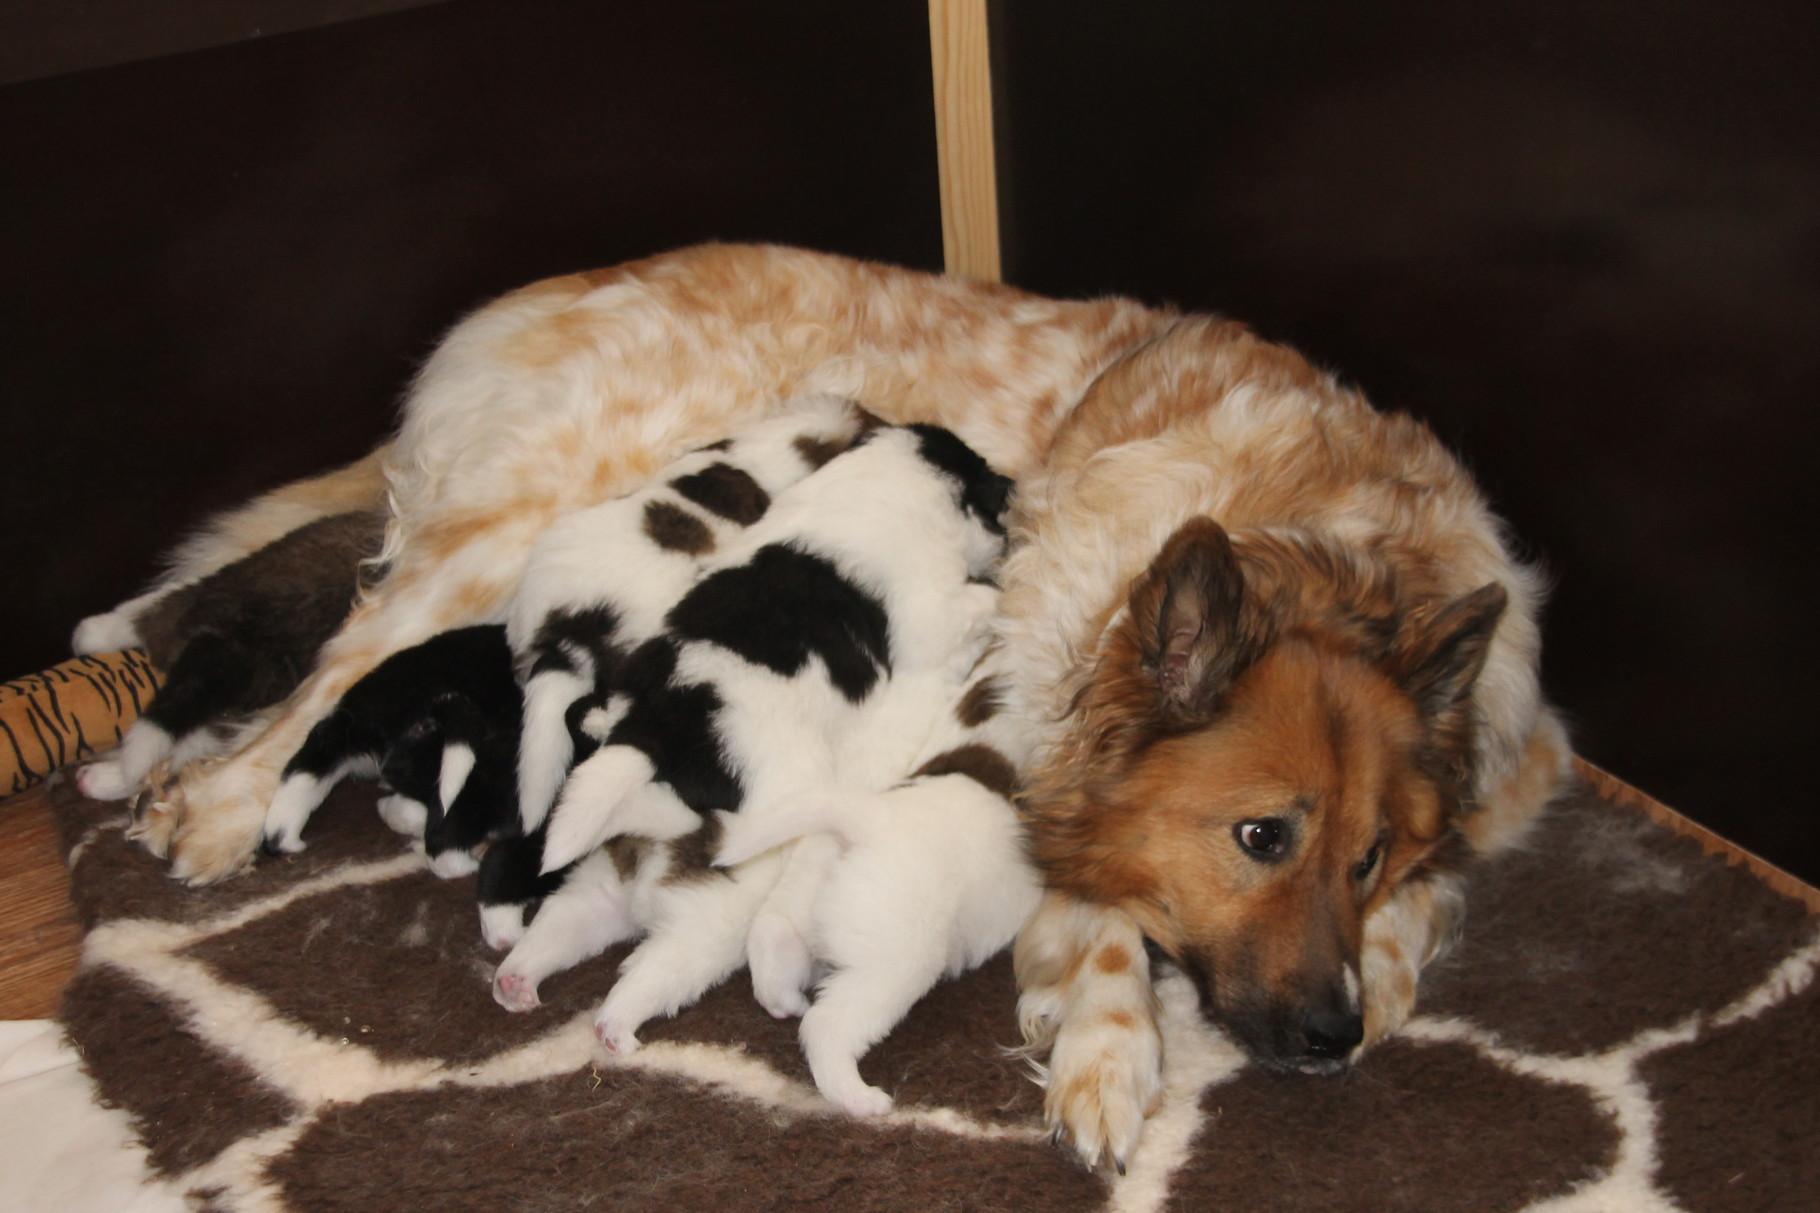 und säugende Mamas müde